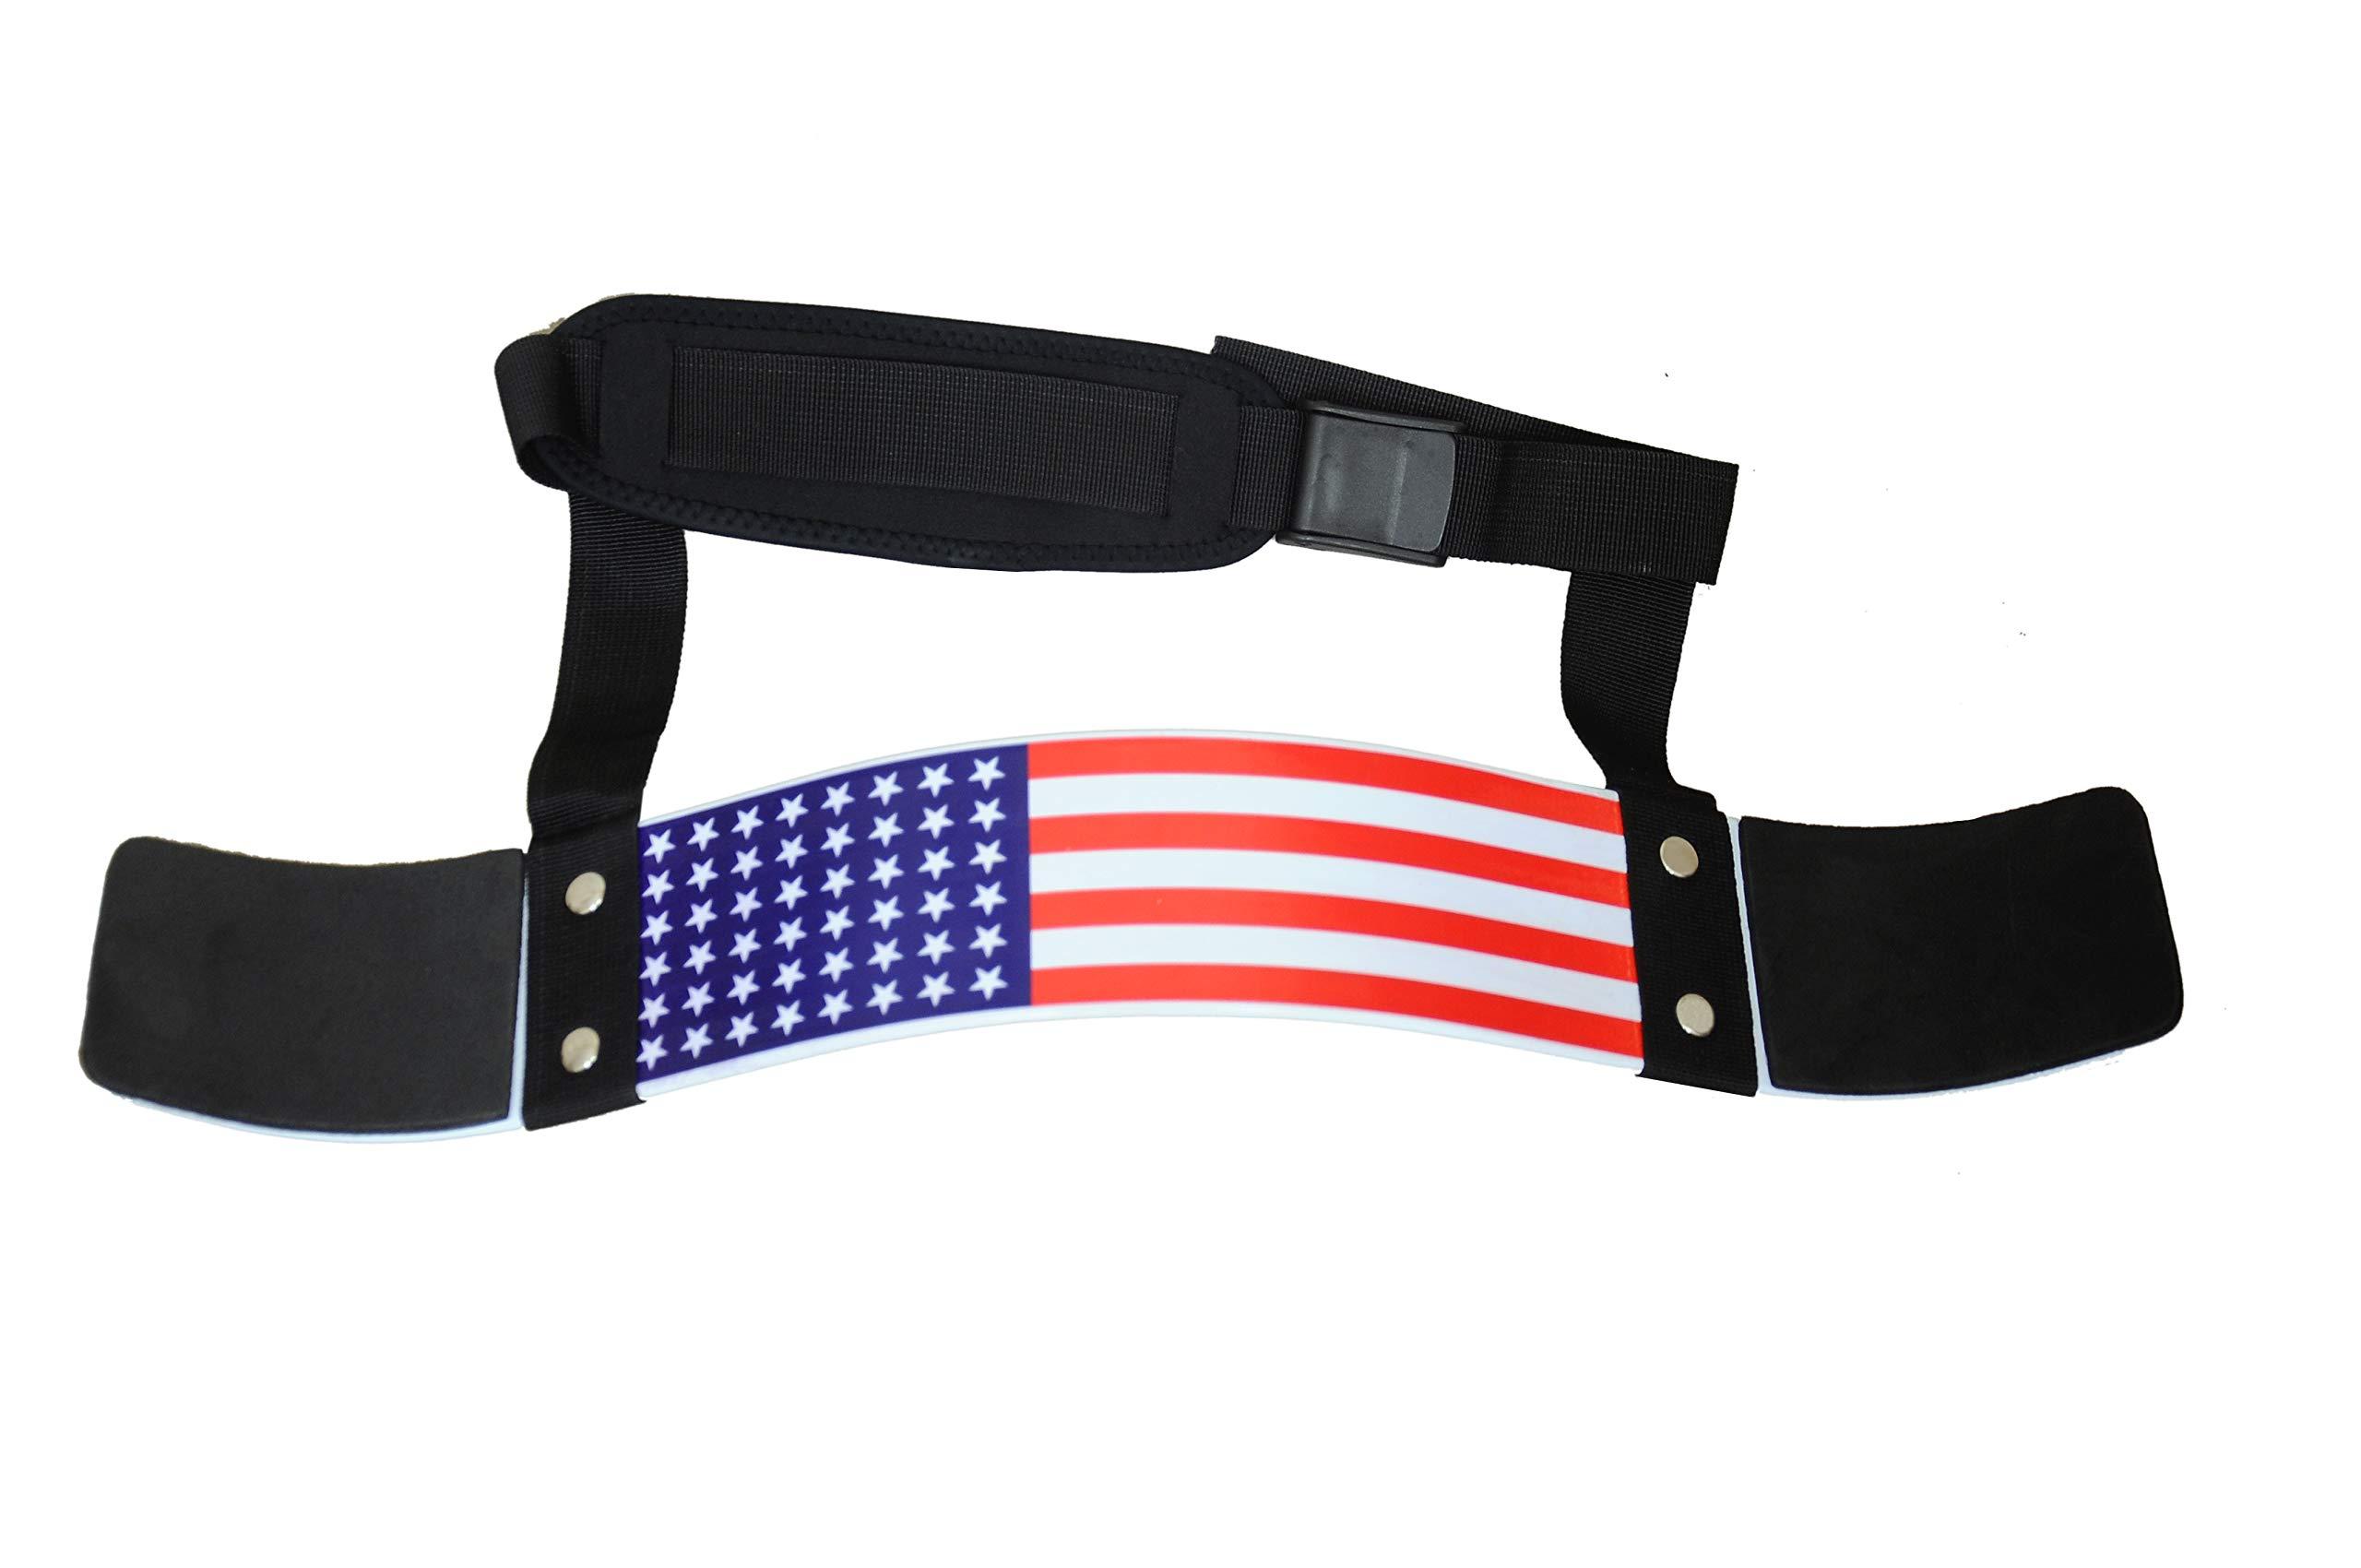 RAD Arm Blaster Body Building Bomber Bicep Curl Triceps Muscle Builder (American)